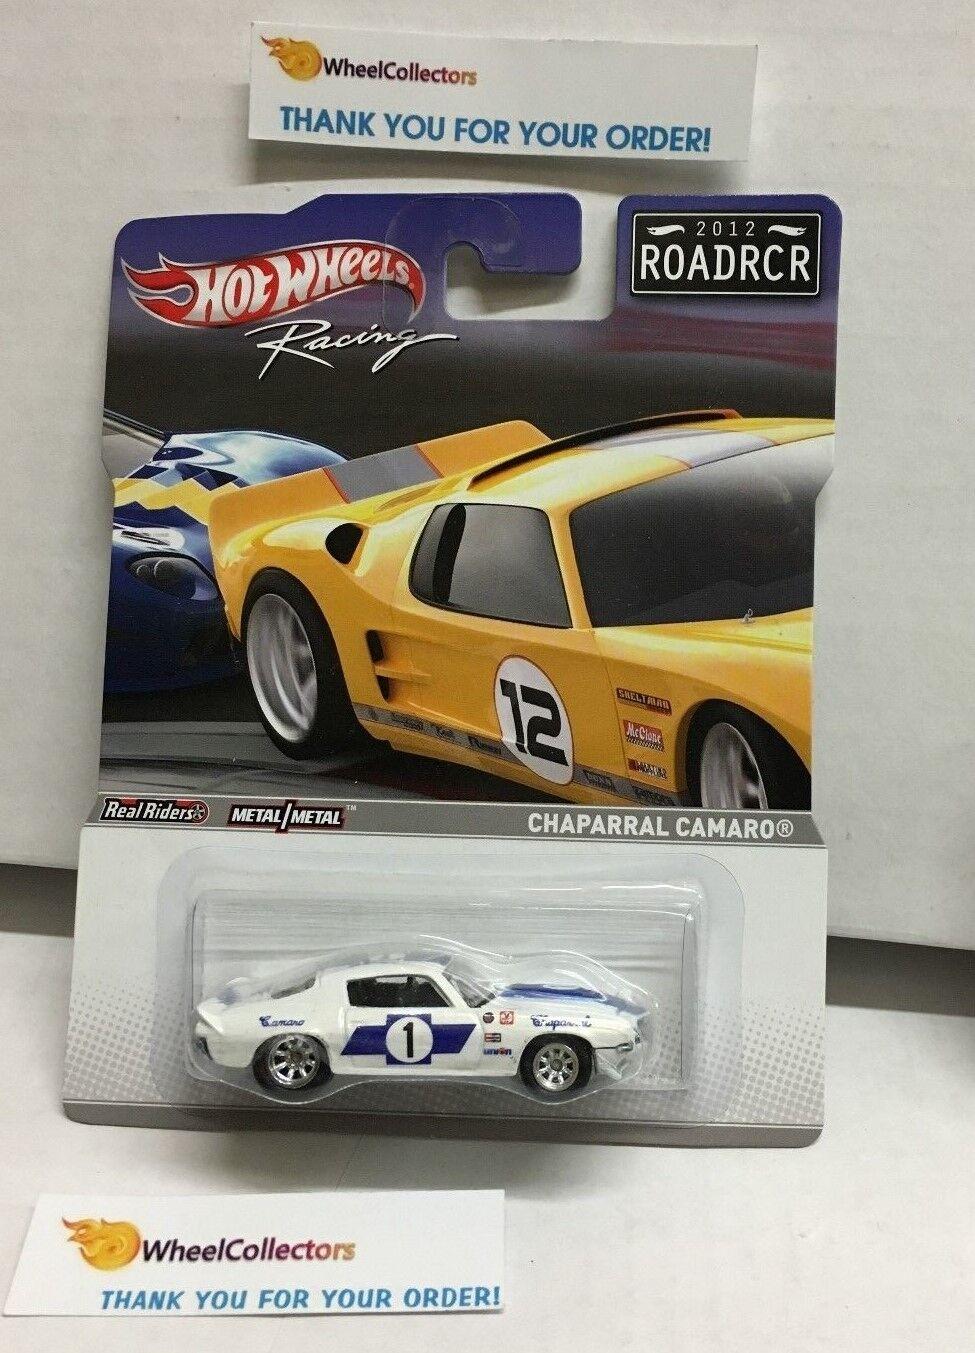 Racing Road Racers Series  Chaparral Camaro  2012 Hot Hot Hot Wheels  ROADRCR  G53 99a826